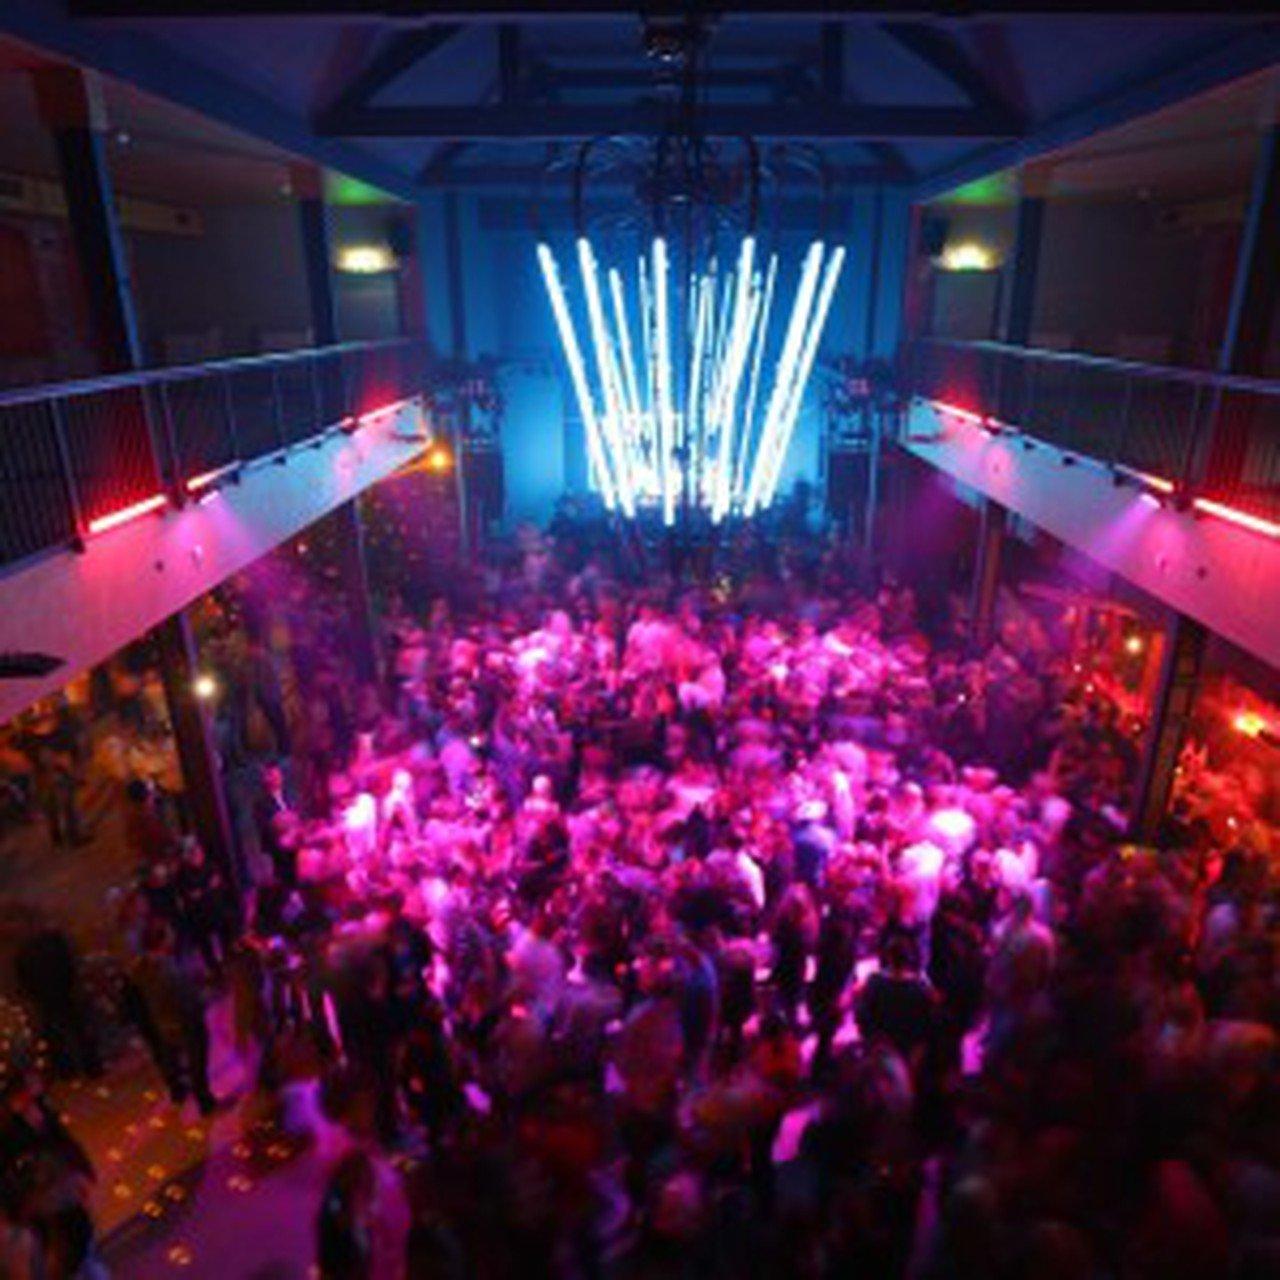 Leipzig corporate event spaces Industriegebäude Event Space image 0